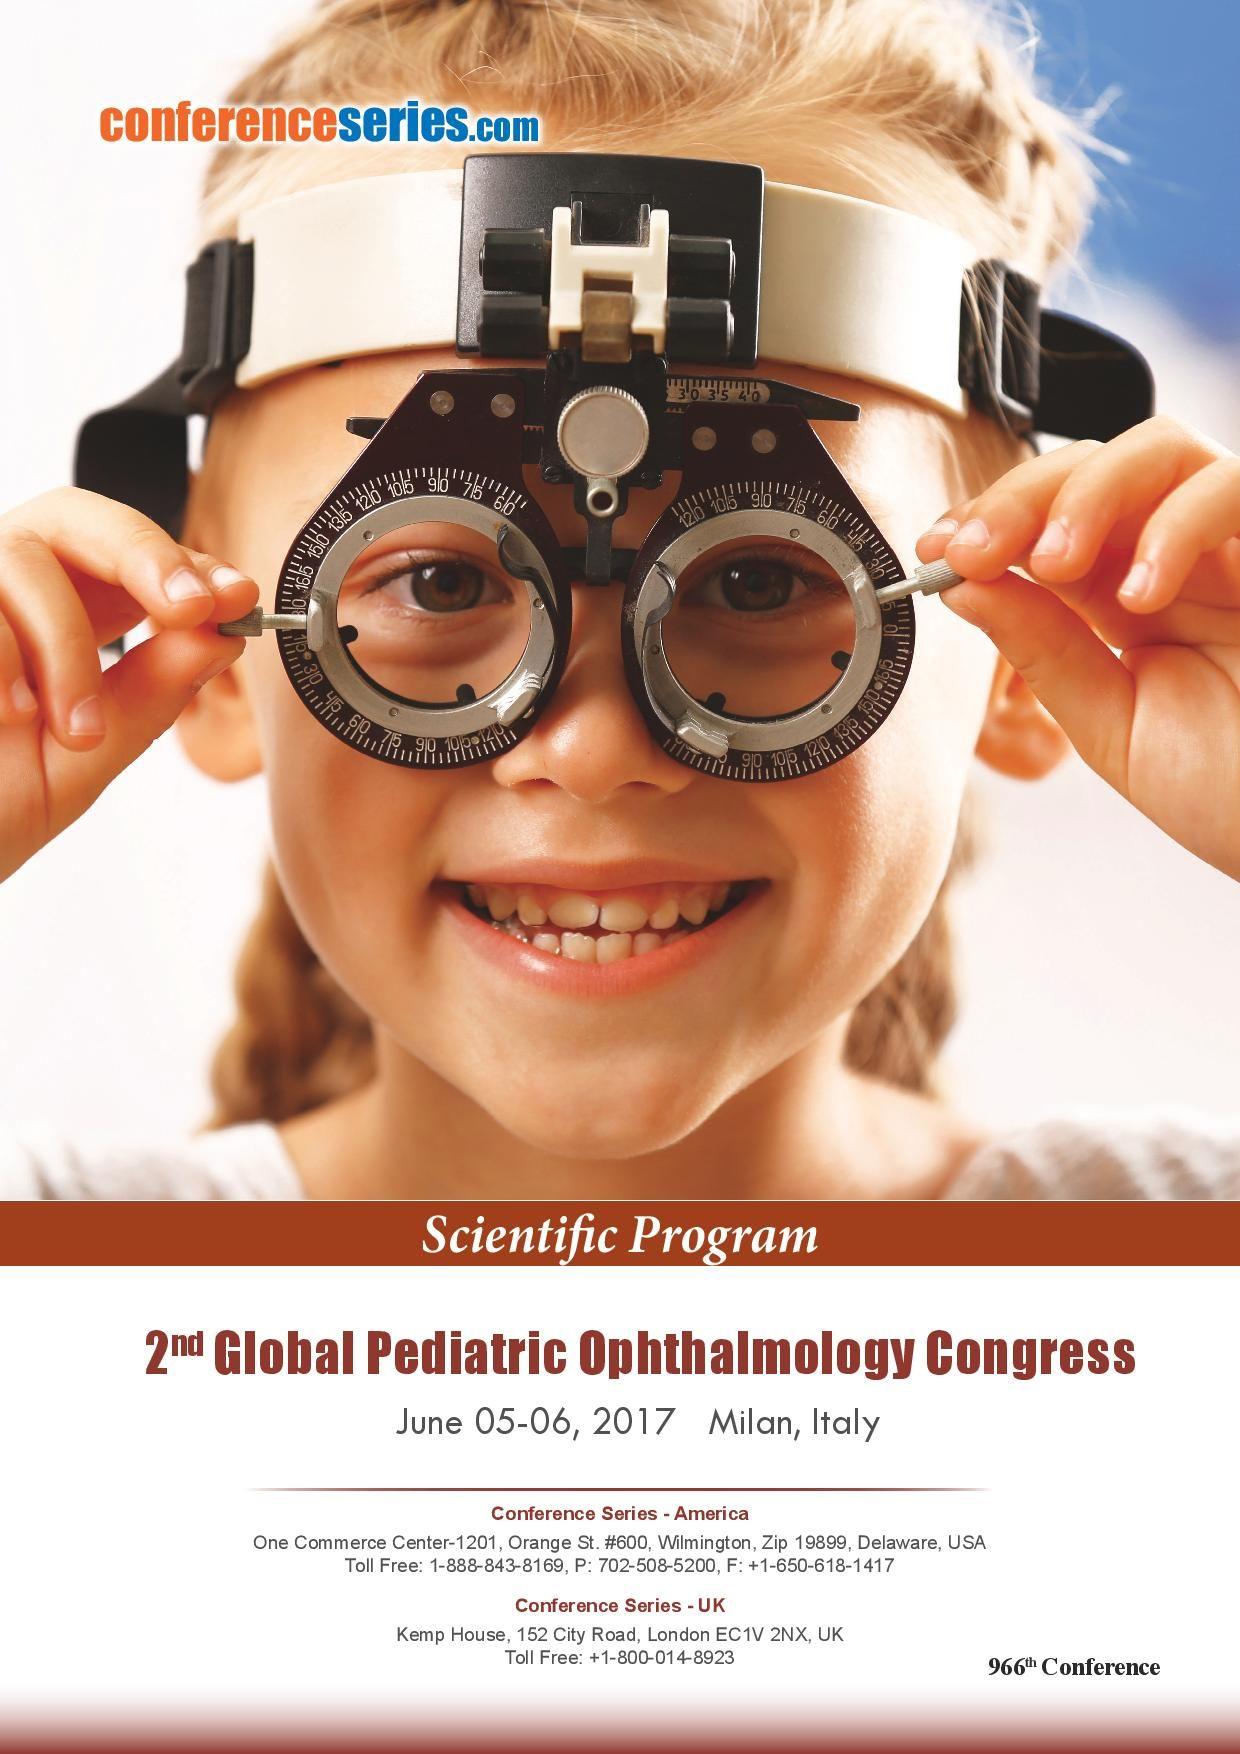 2nd Global #Pediatric #Ophthalmology Congress June 05-06